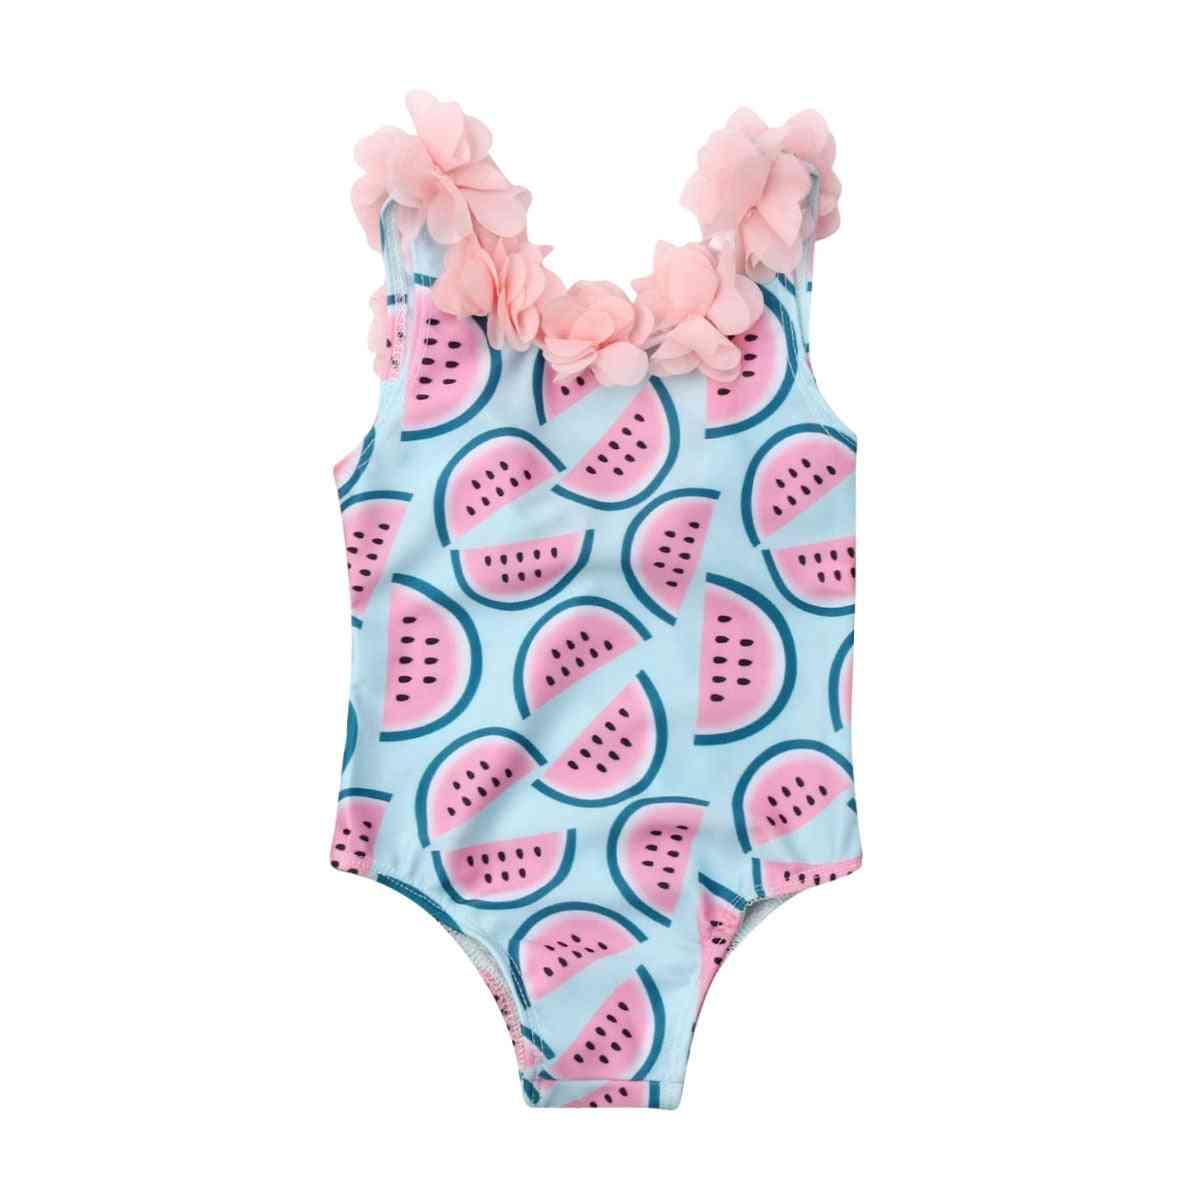 Baby Watermelon Swimsuit, Swimwear Bikini Bodysuit